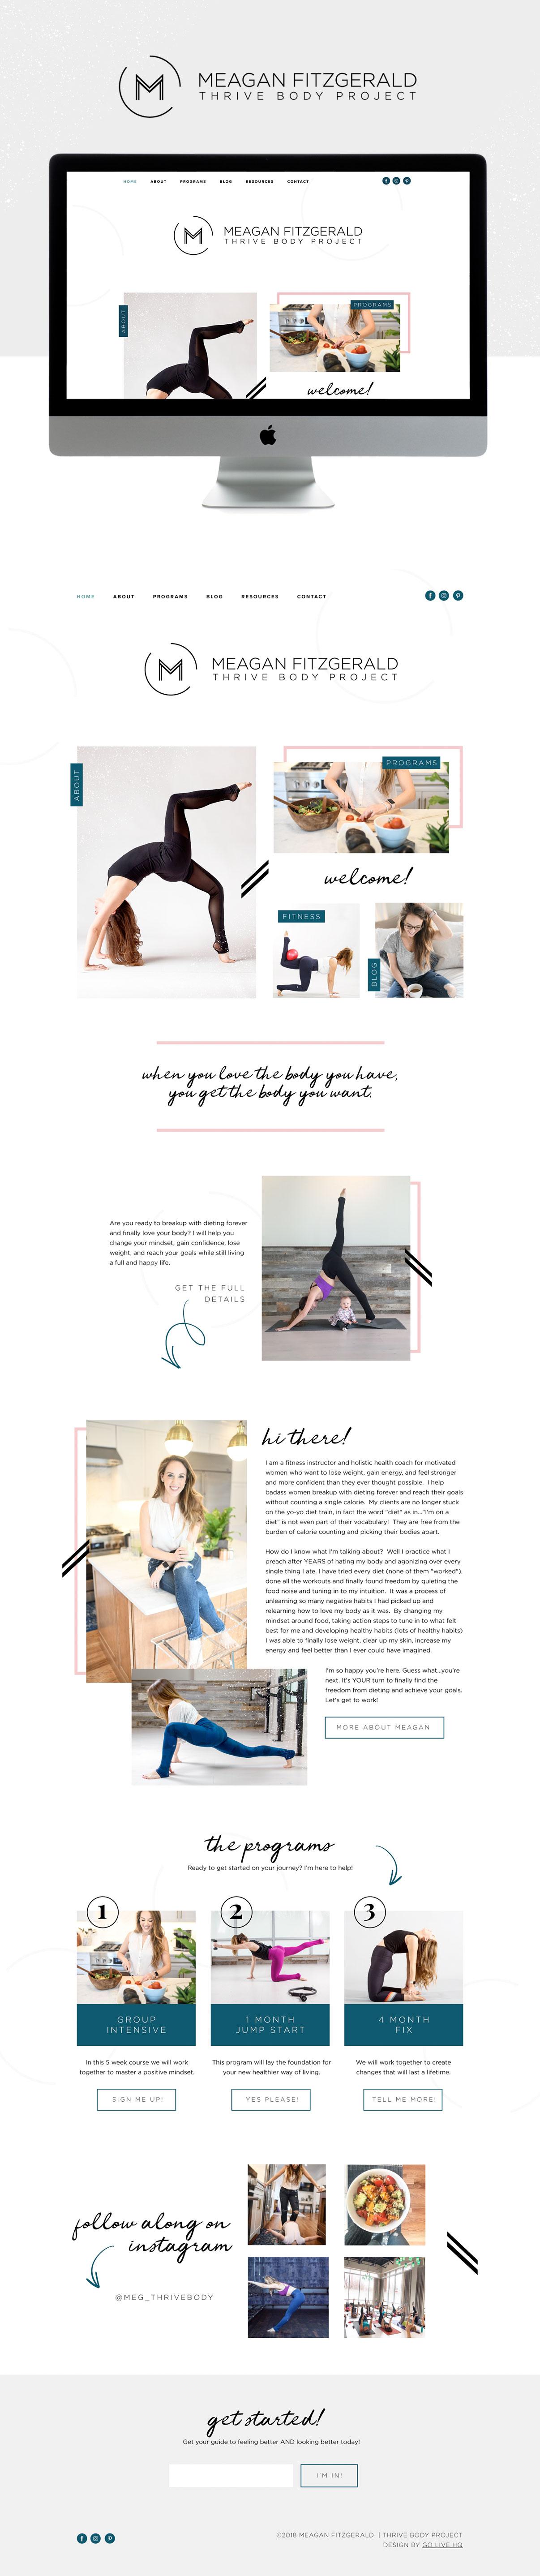 Creative Website Design for Health and Wellness Blog | Website Design by Go Live HQ